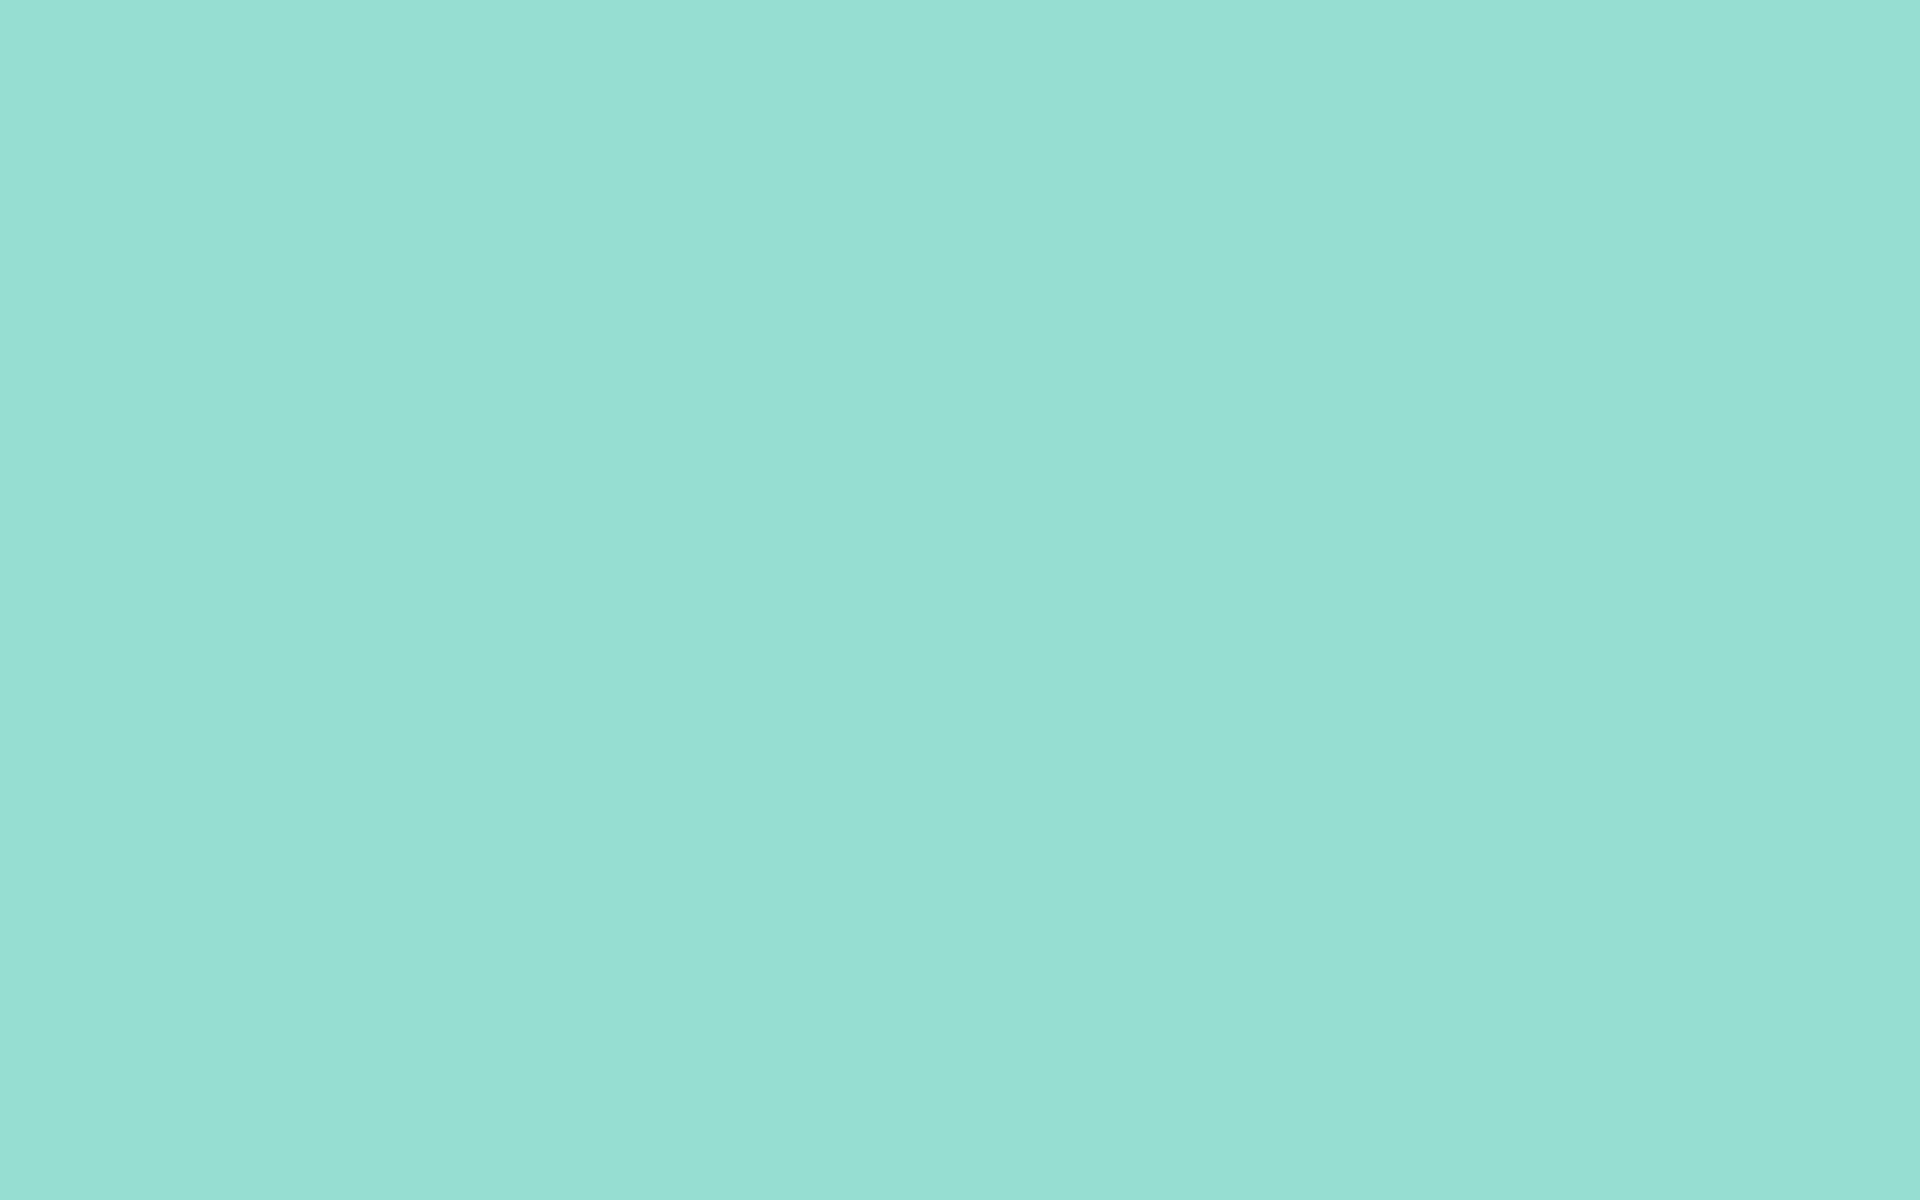 1920x1200 Pale Robin Egg Blue Solid Color Background